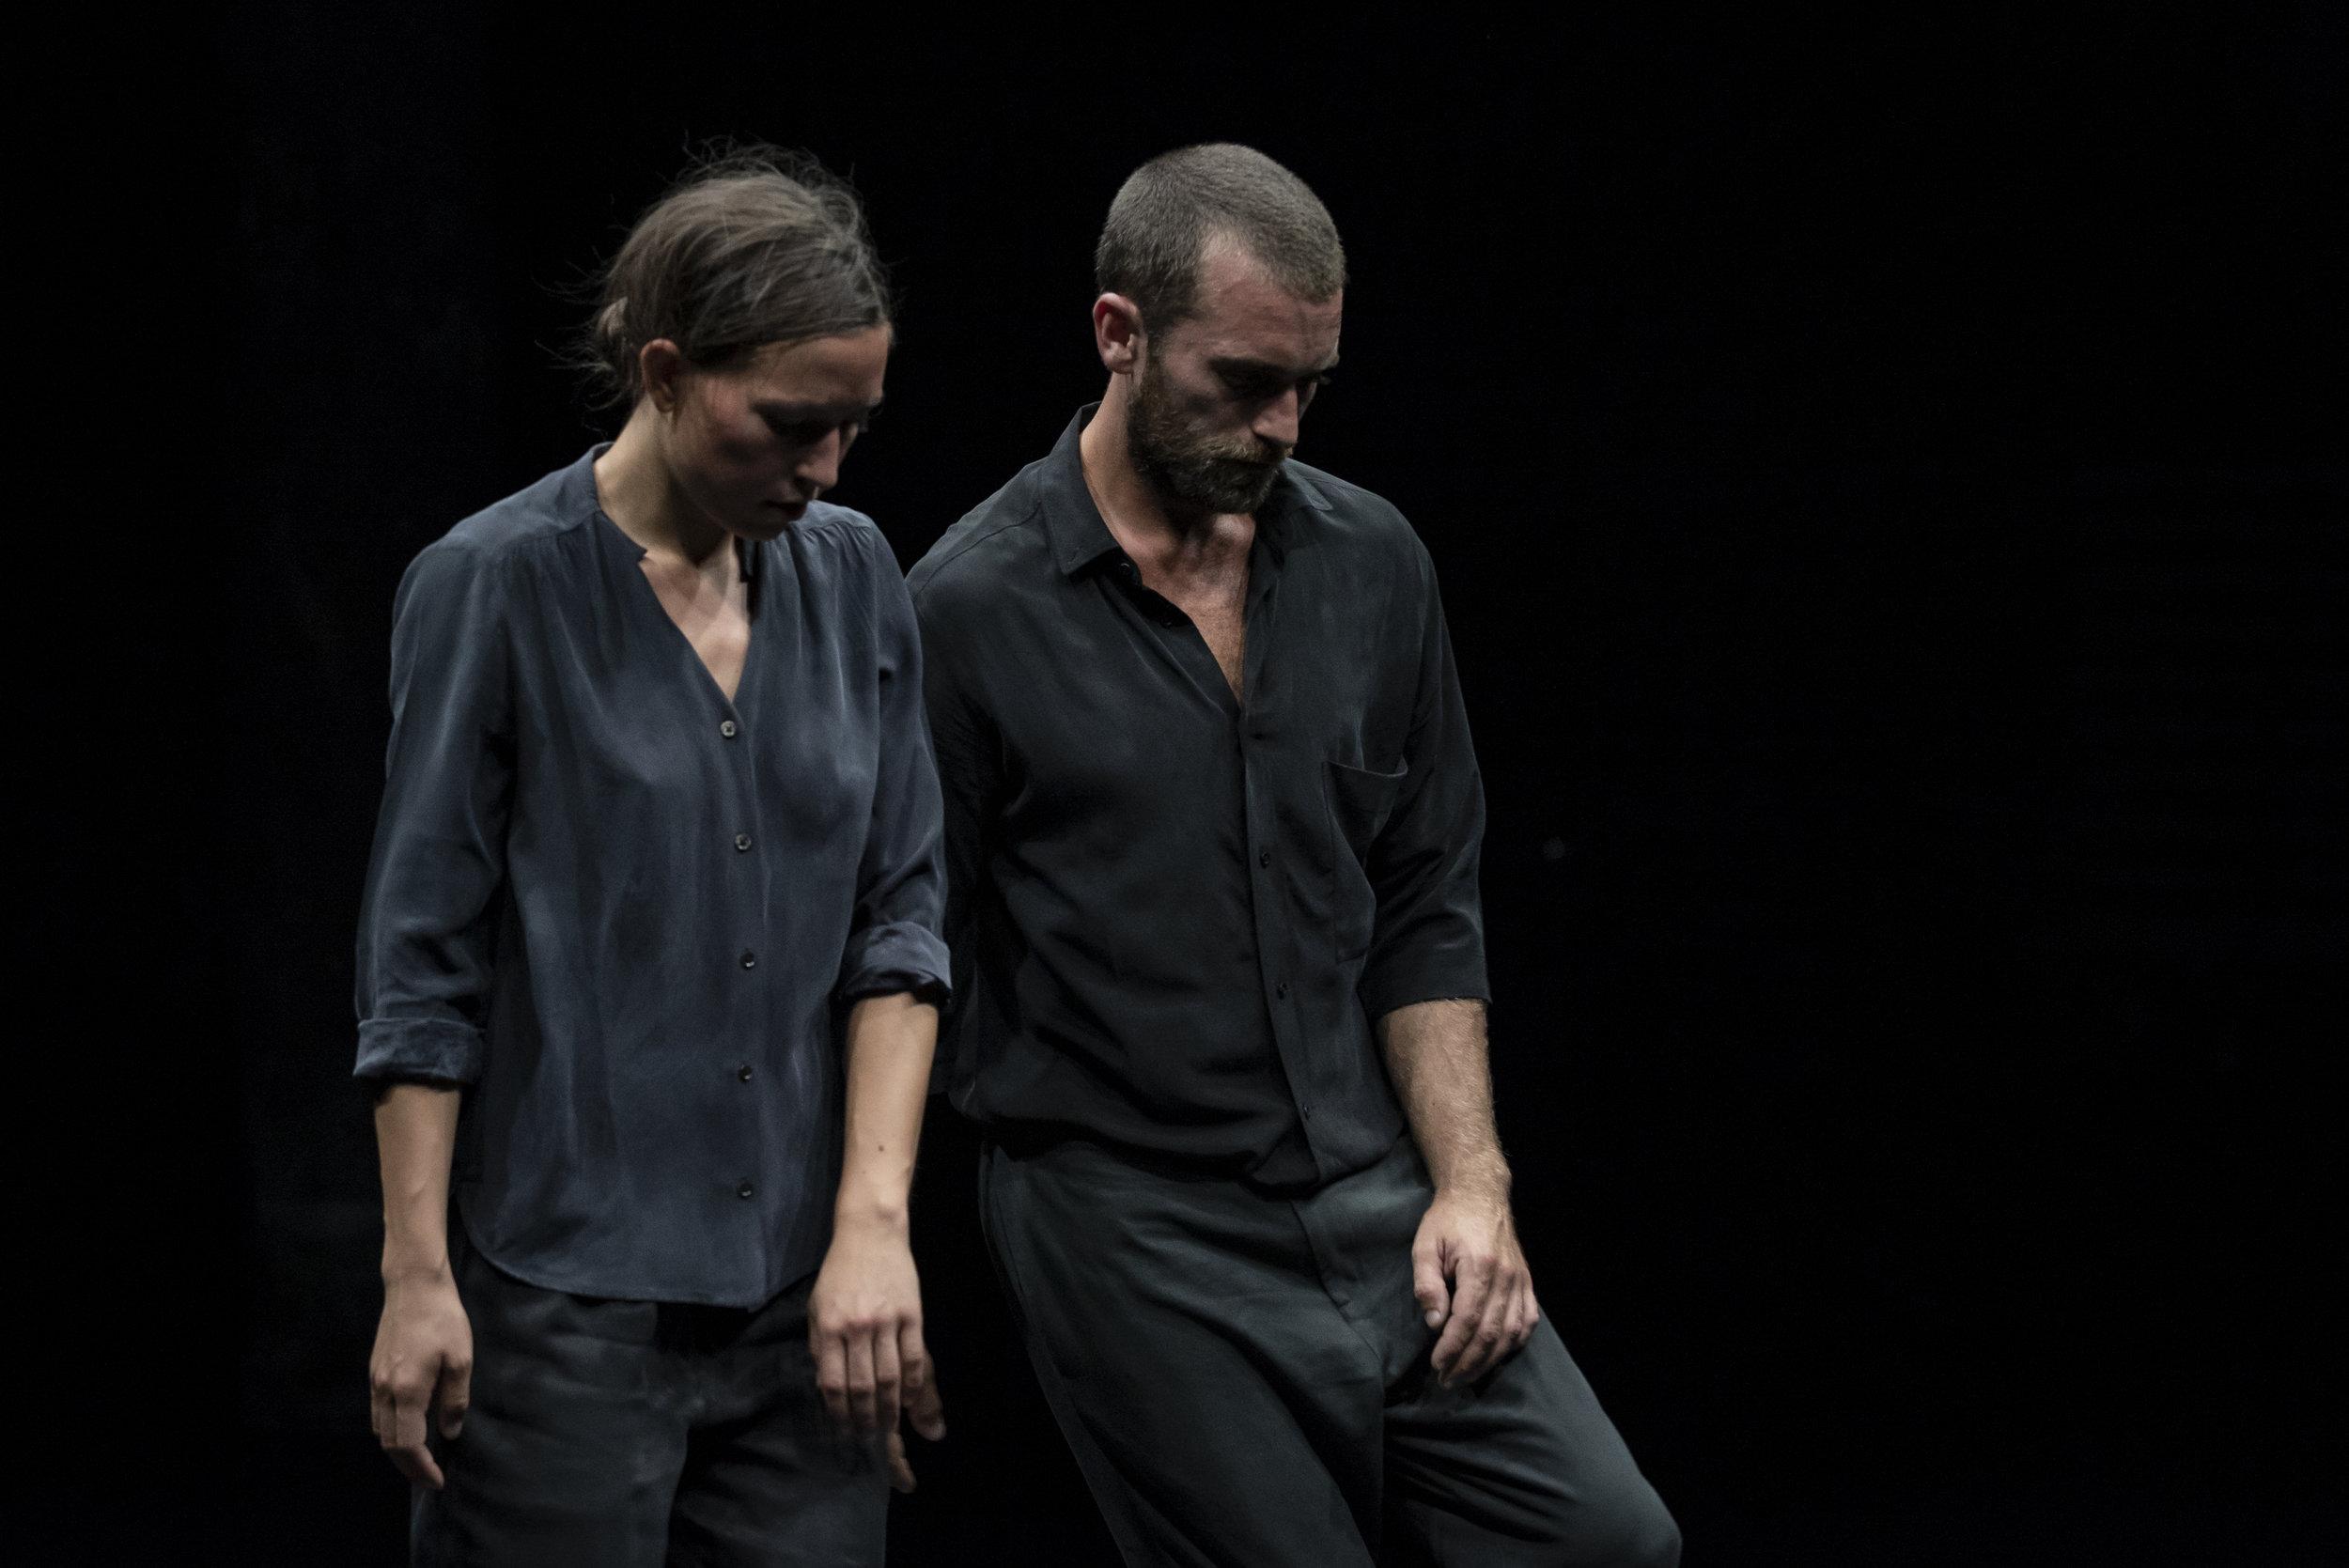 Angela Rabaglio & Micaël Florentz - The Gyre (2018)